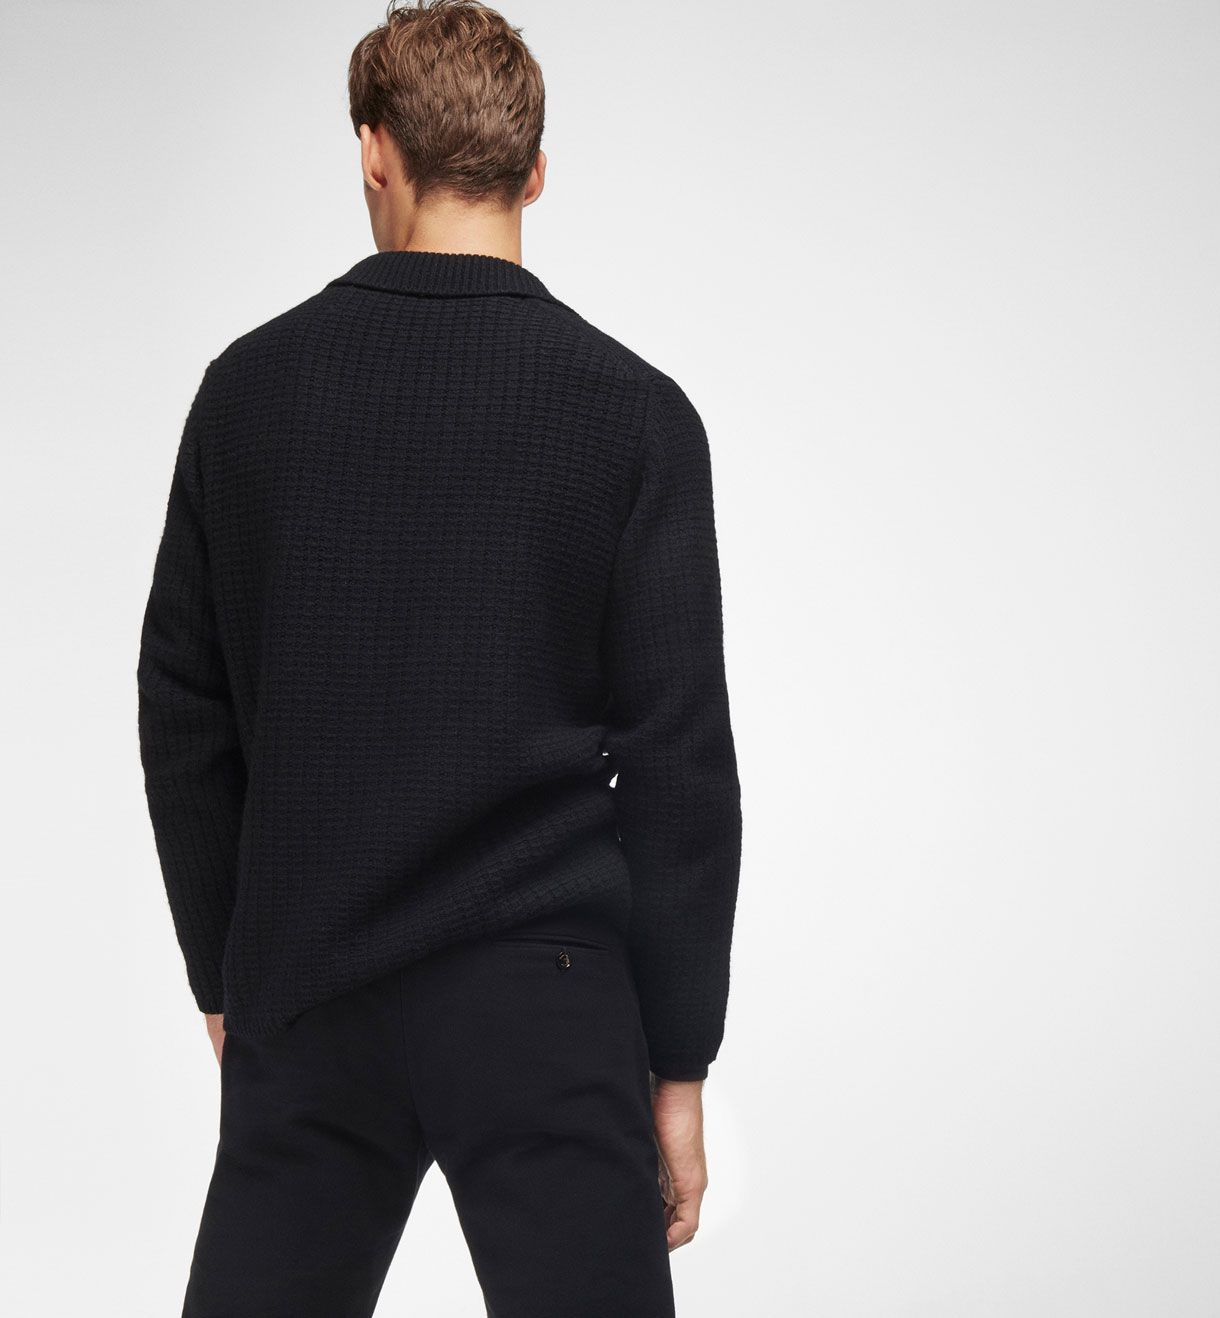 BLAZER-STYLE TEXTURED WEAVE CARDIGAN, Casual shirts - MEN - Massimo Dutti